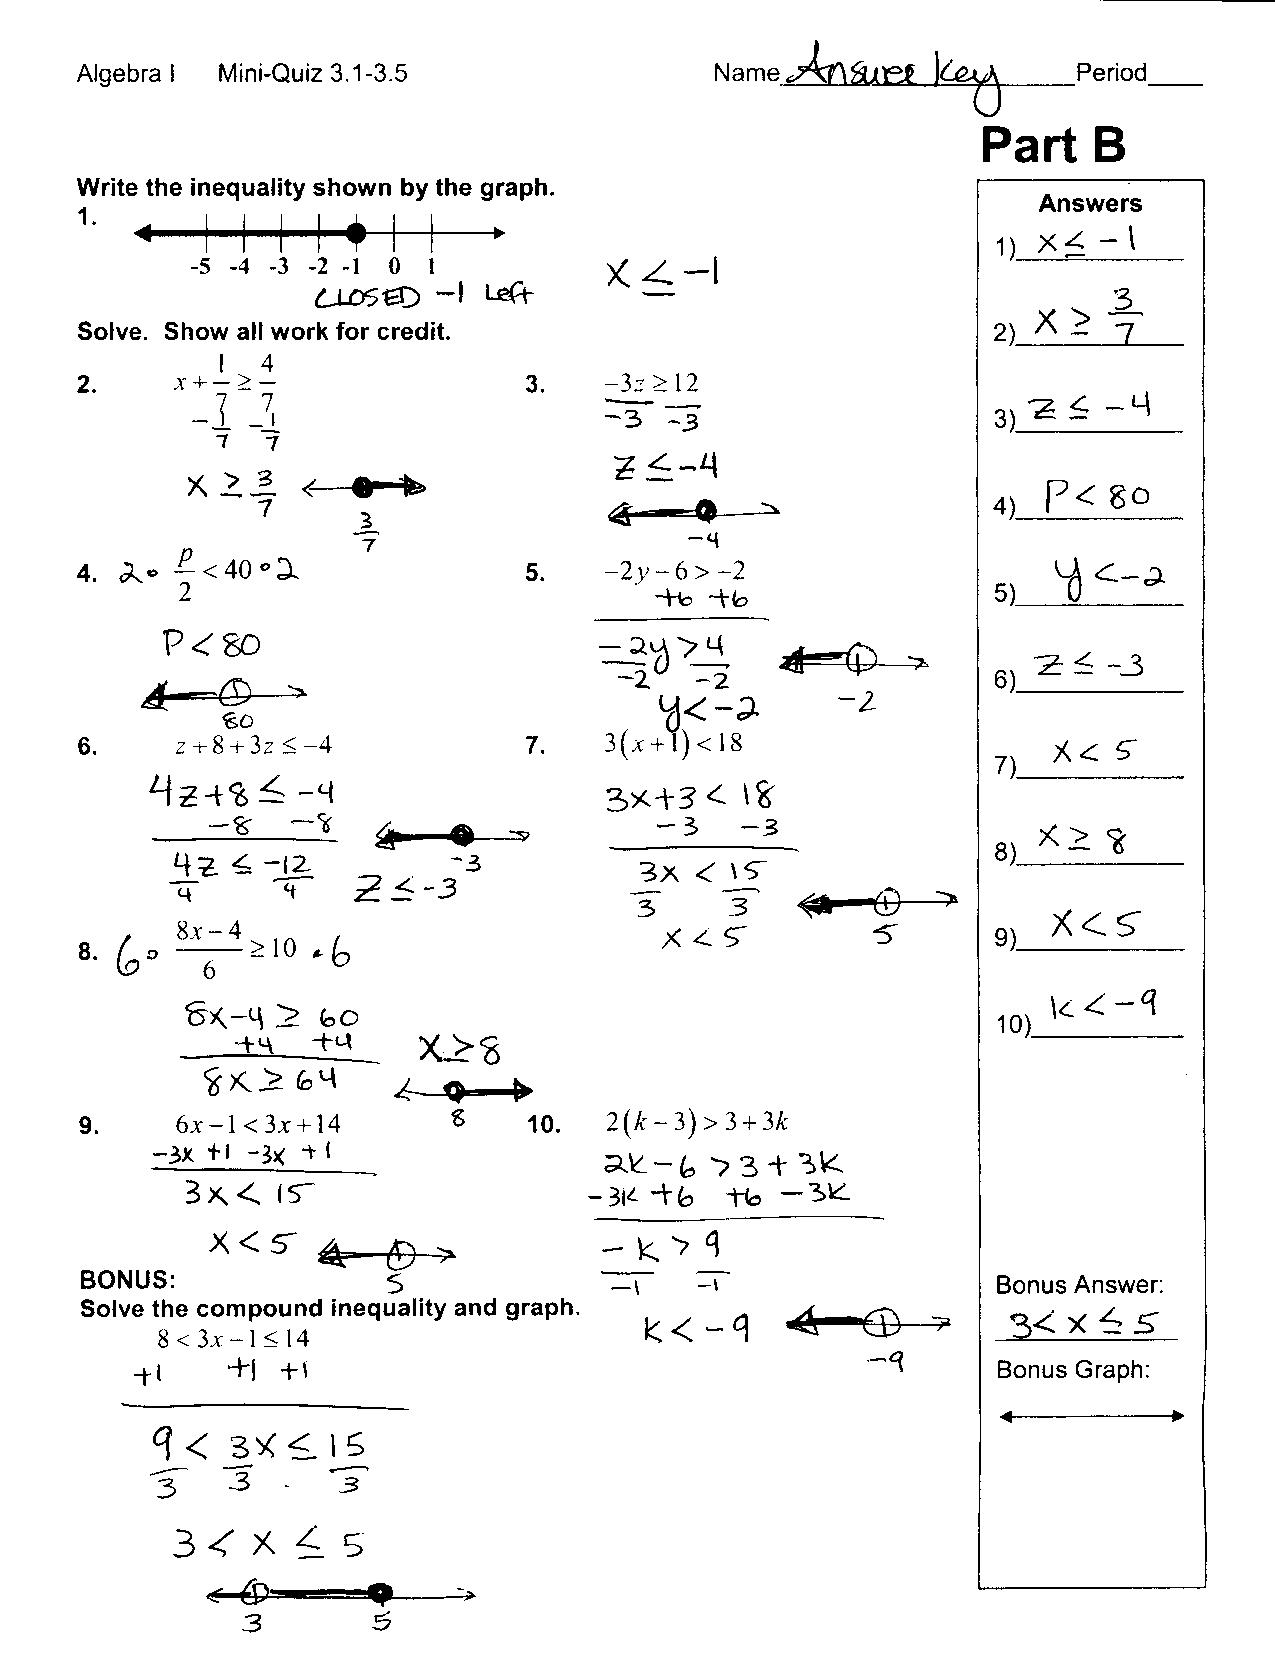 Algebra Worksheet - City Elementary